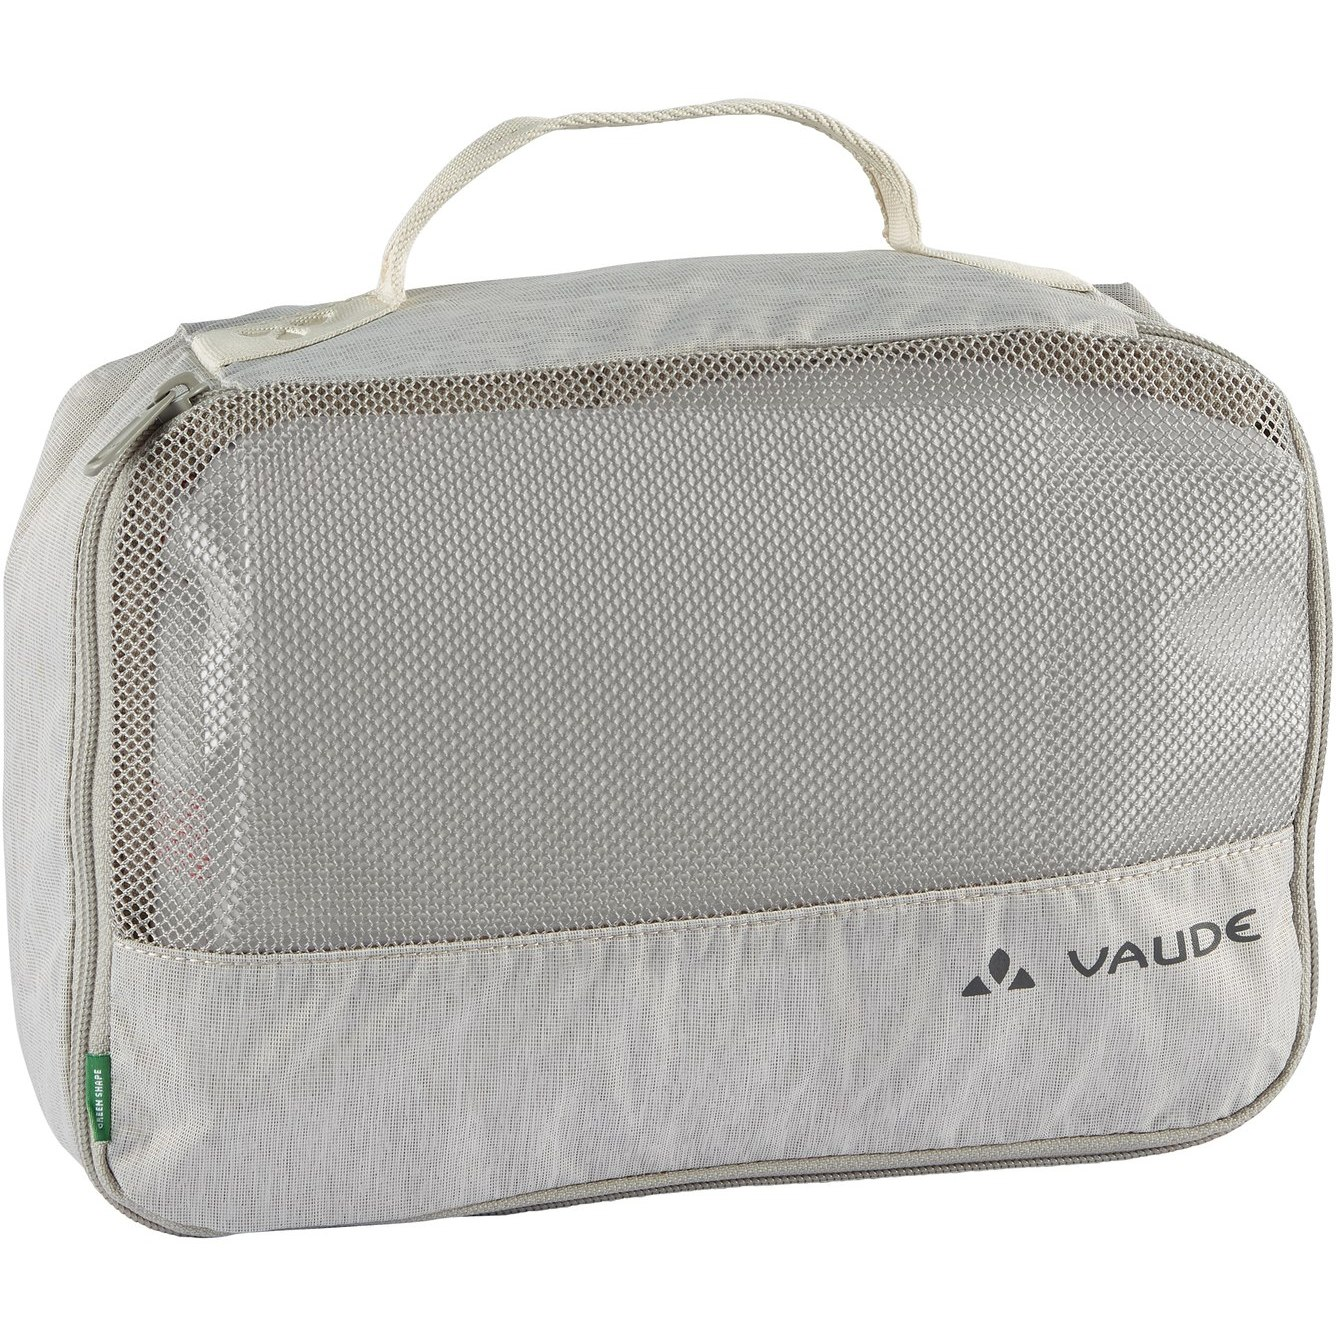 Vaude Trip Box - Reisetasche S - dove